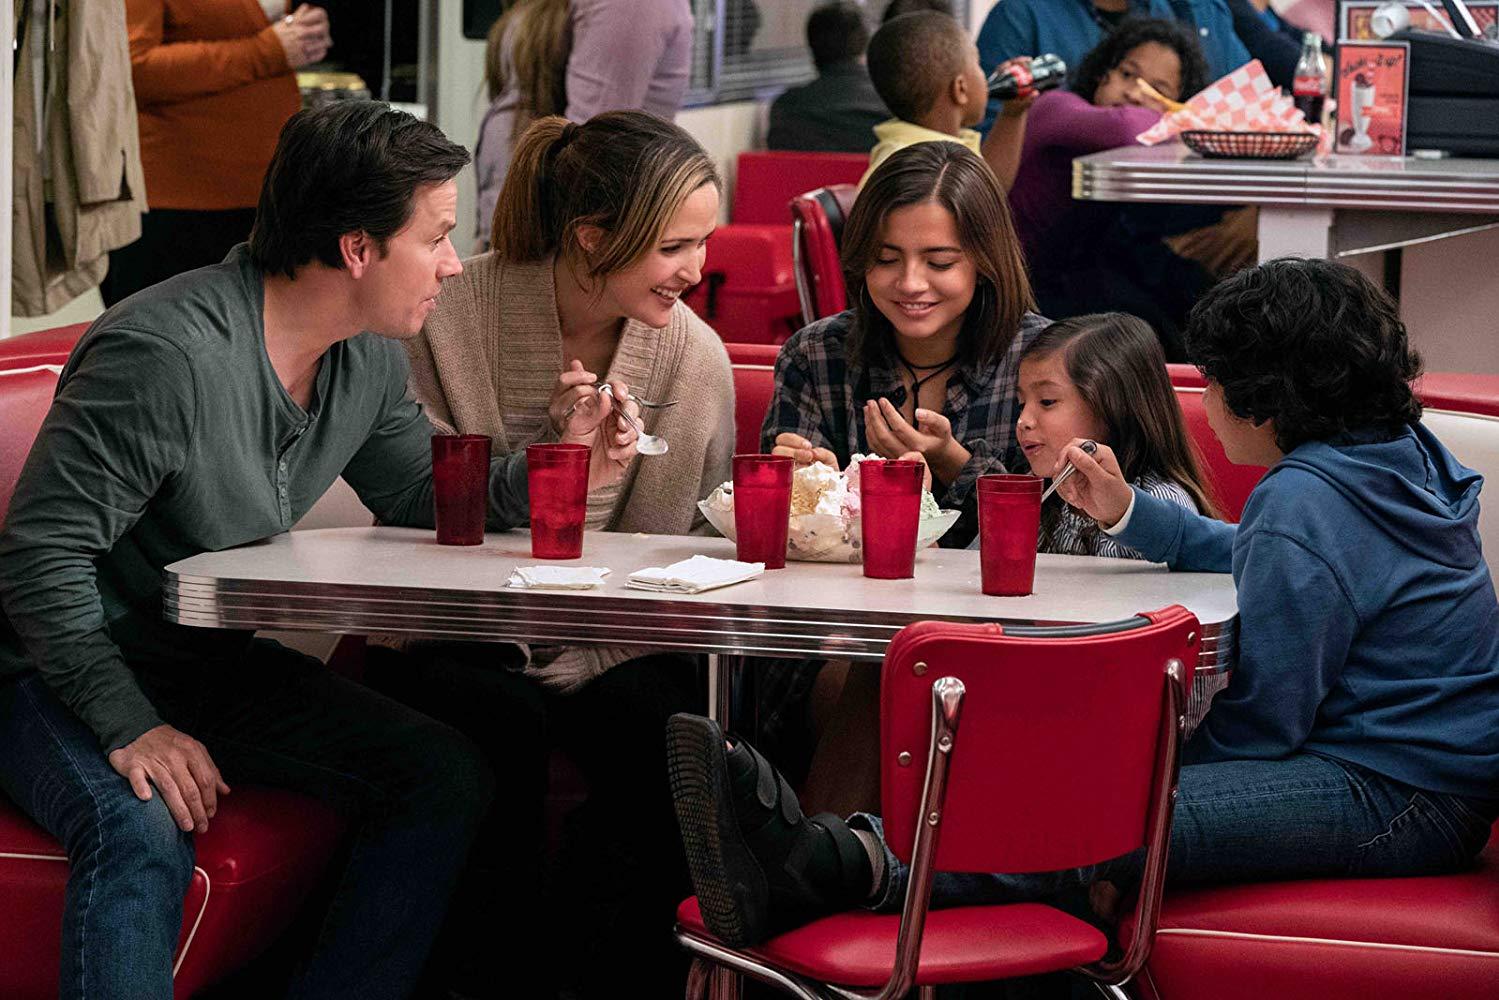 Instant Family: Mark Wahlberg, Rose Byrne, Gustavo Quiroz, Isabela Moner e Julianna Gamiz in una scena